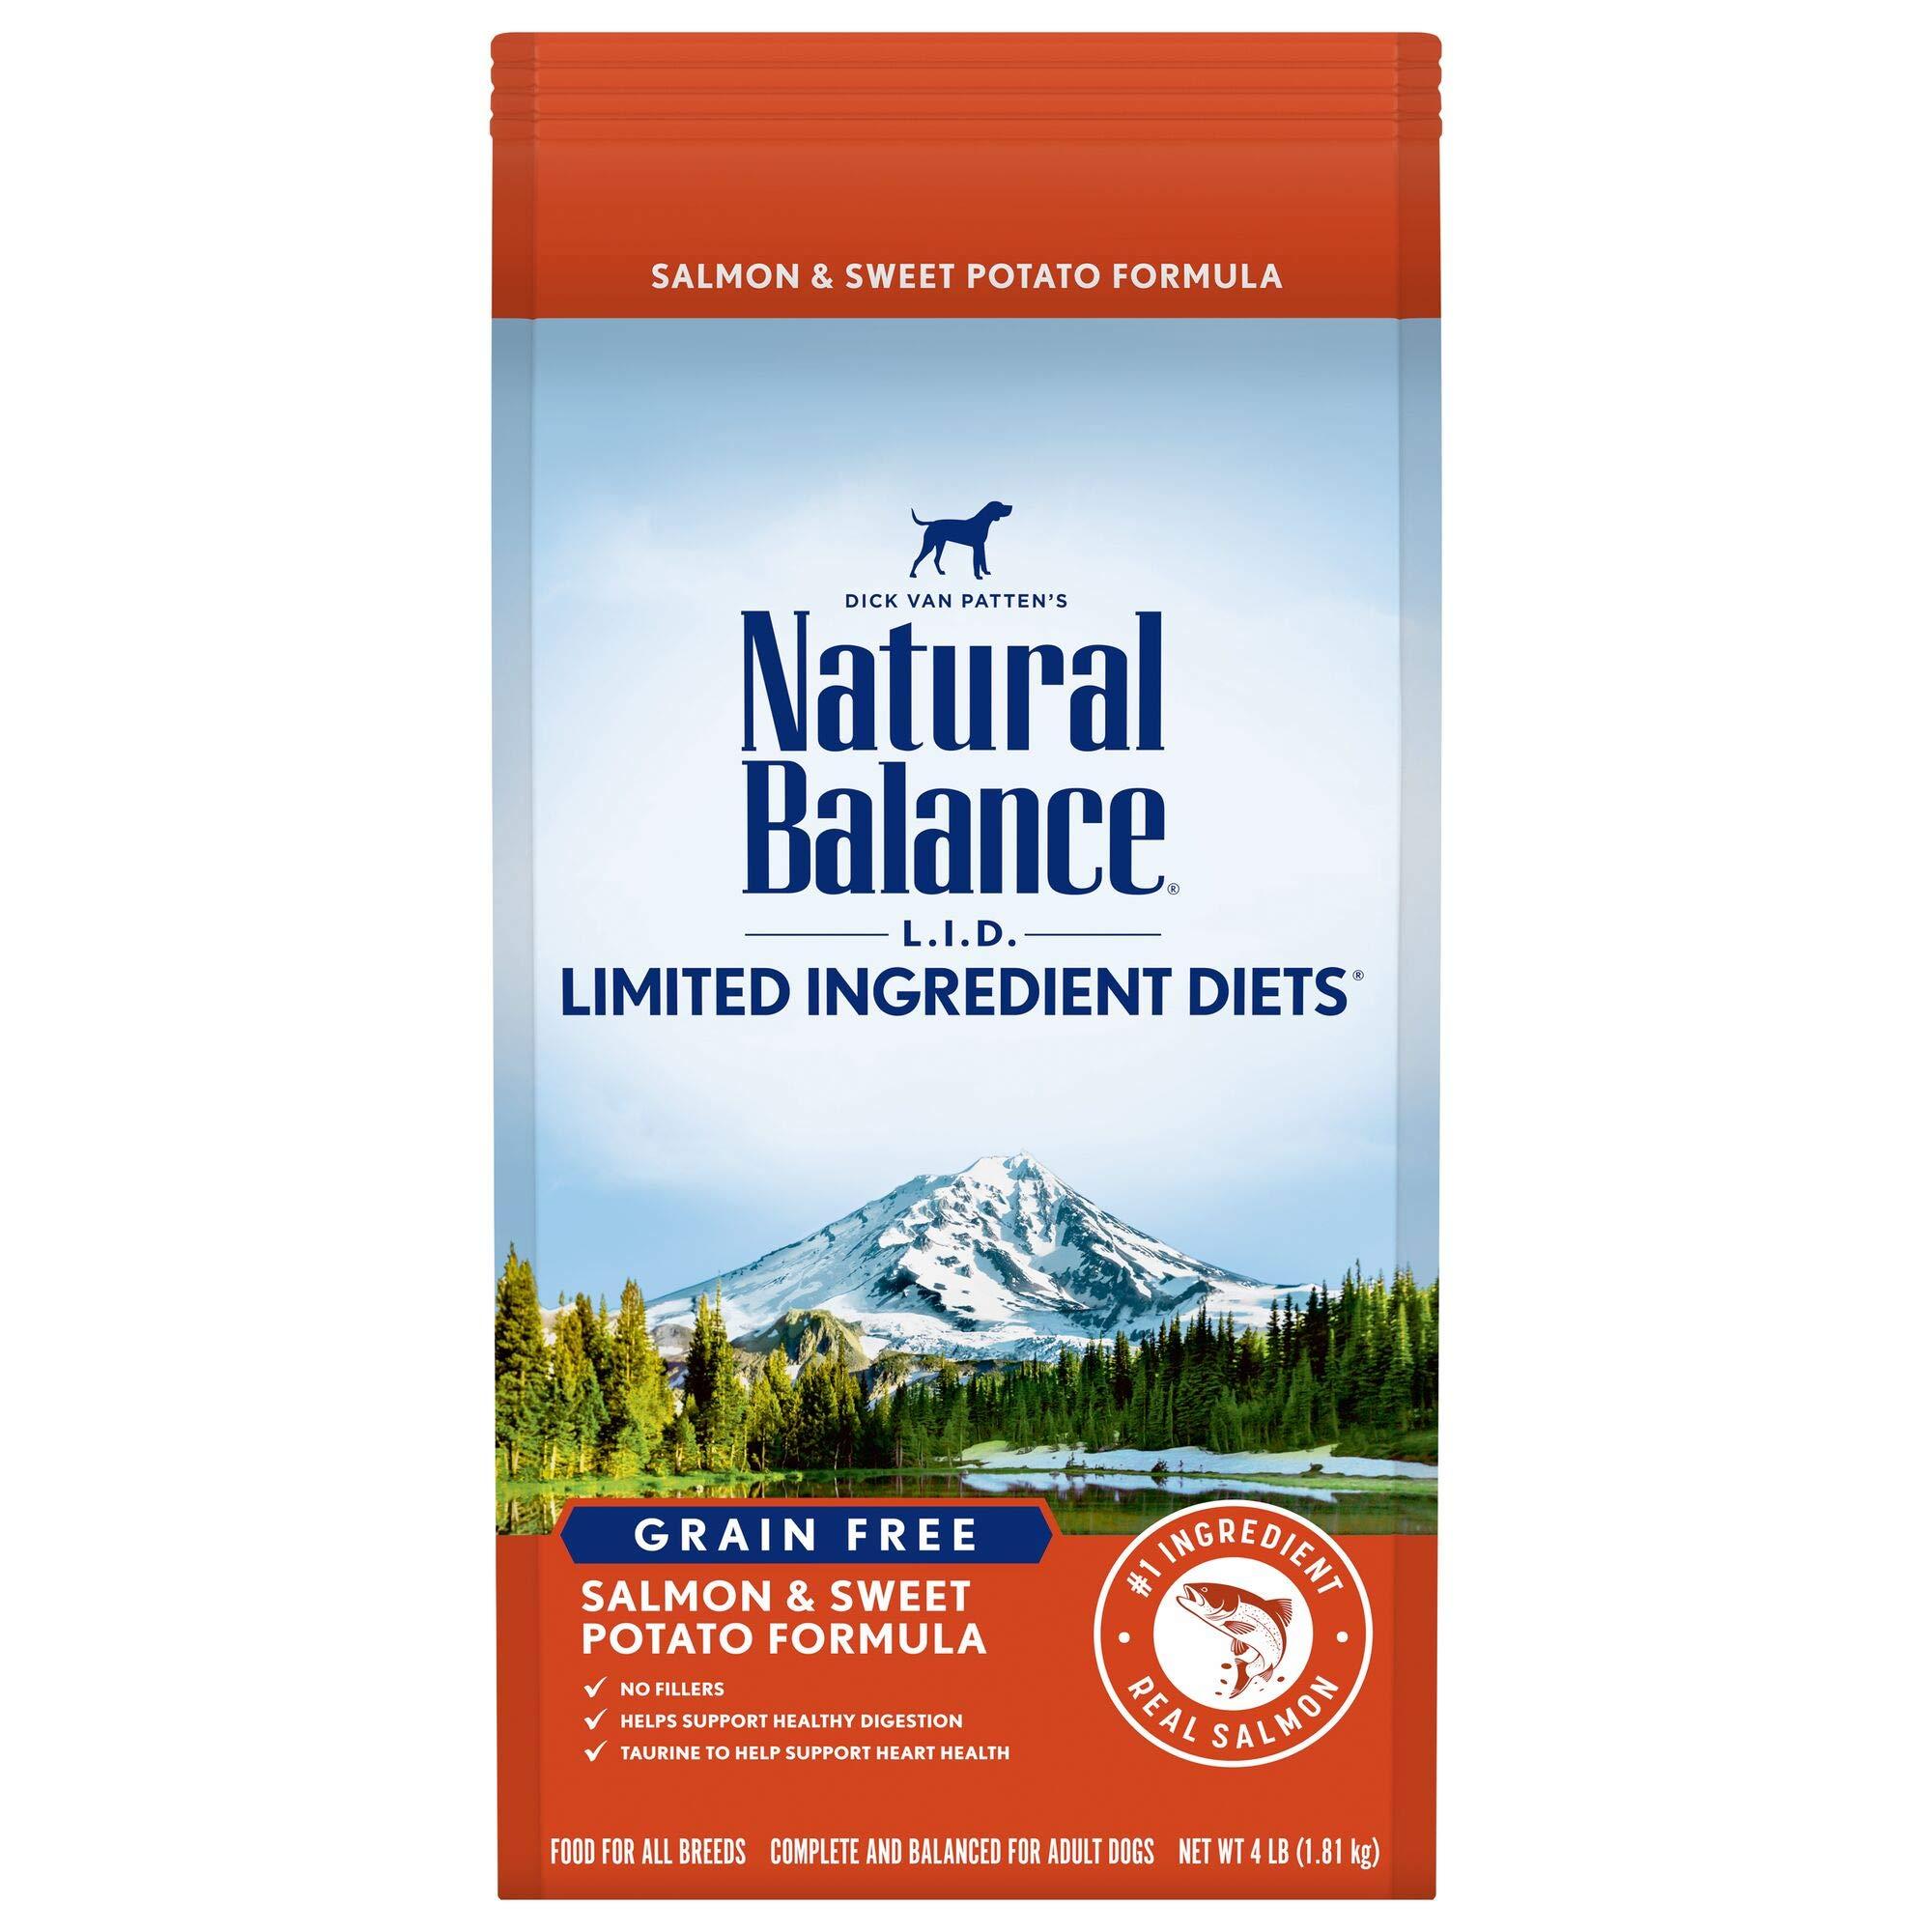 Natural Balance L.I.D. Limited Ingredient Diets Salmon & Sweet Potato Grain-Free Dry Dog Food, 4-lb bag